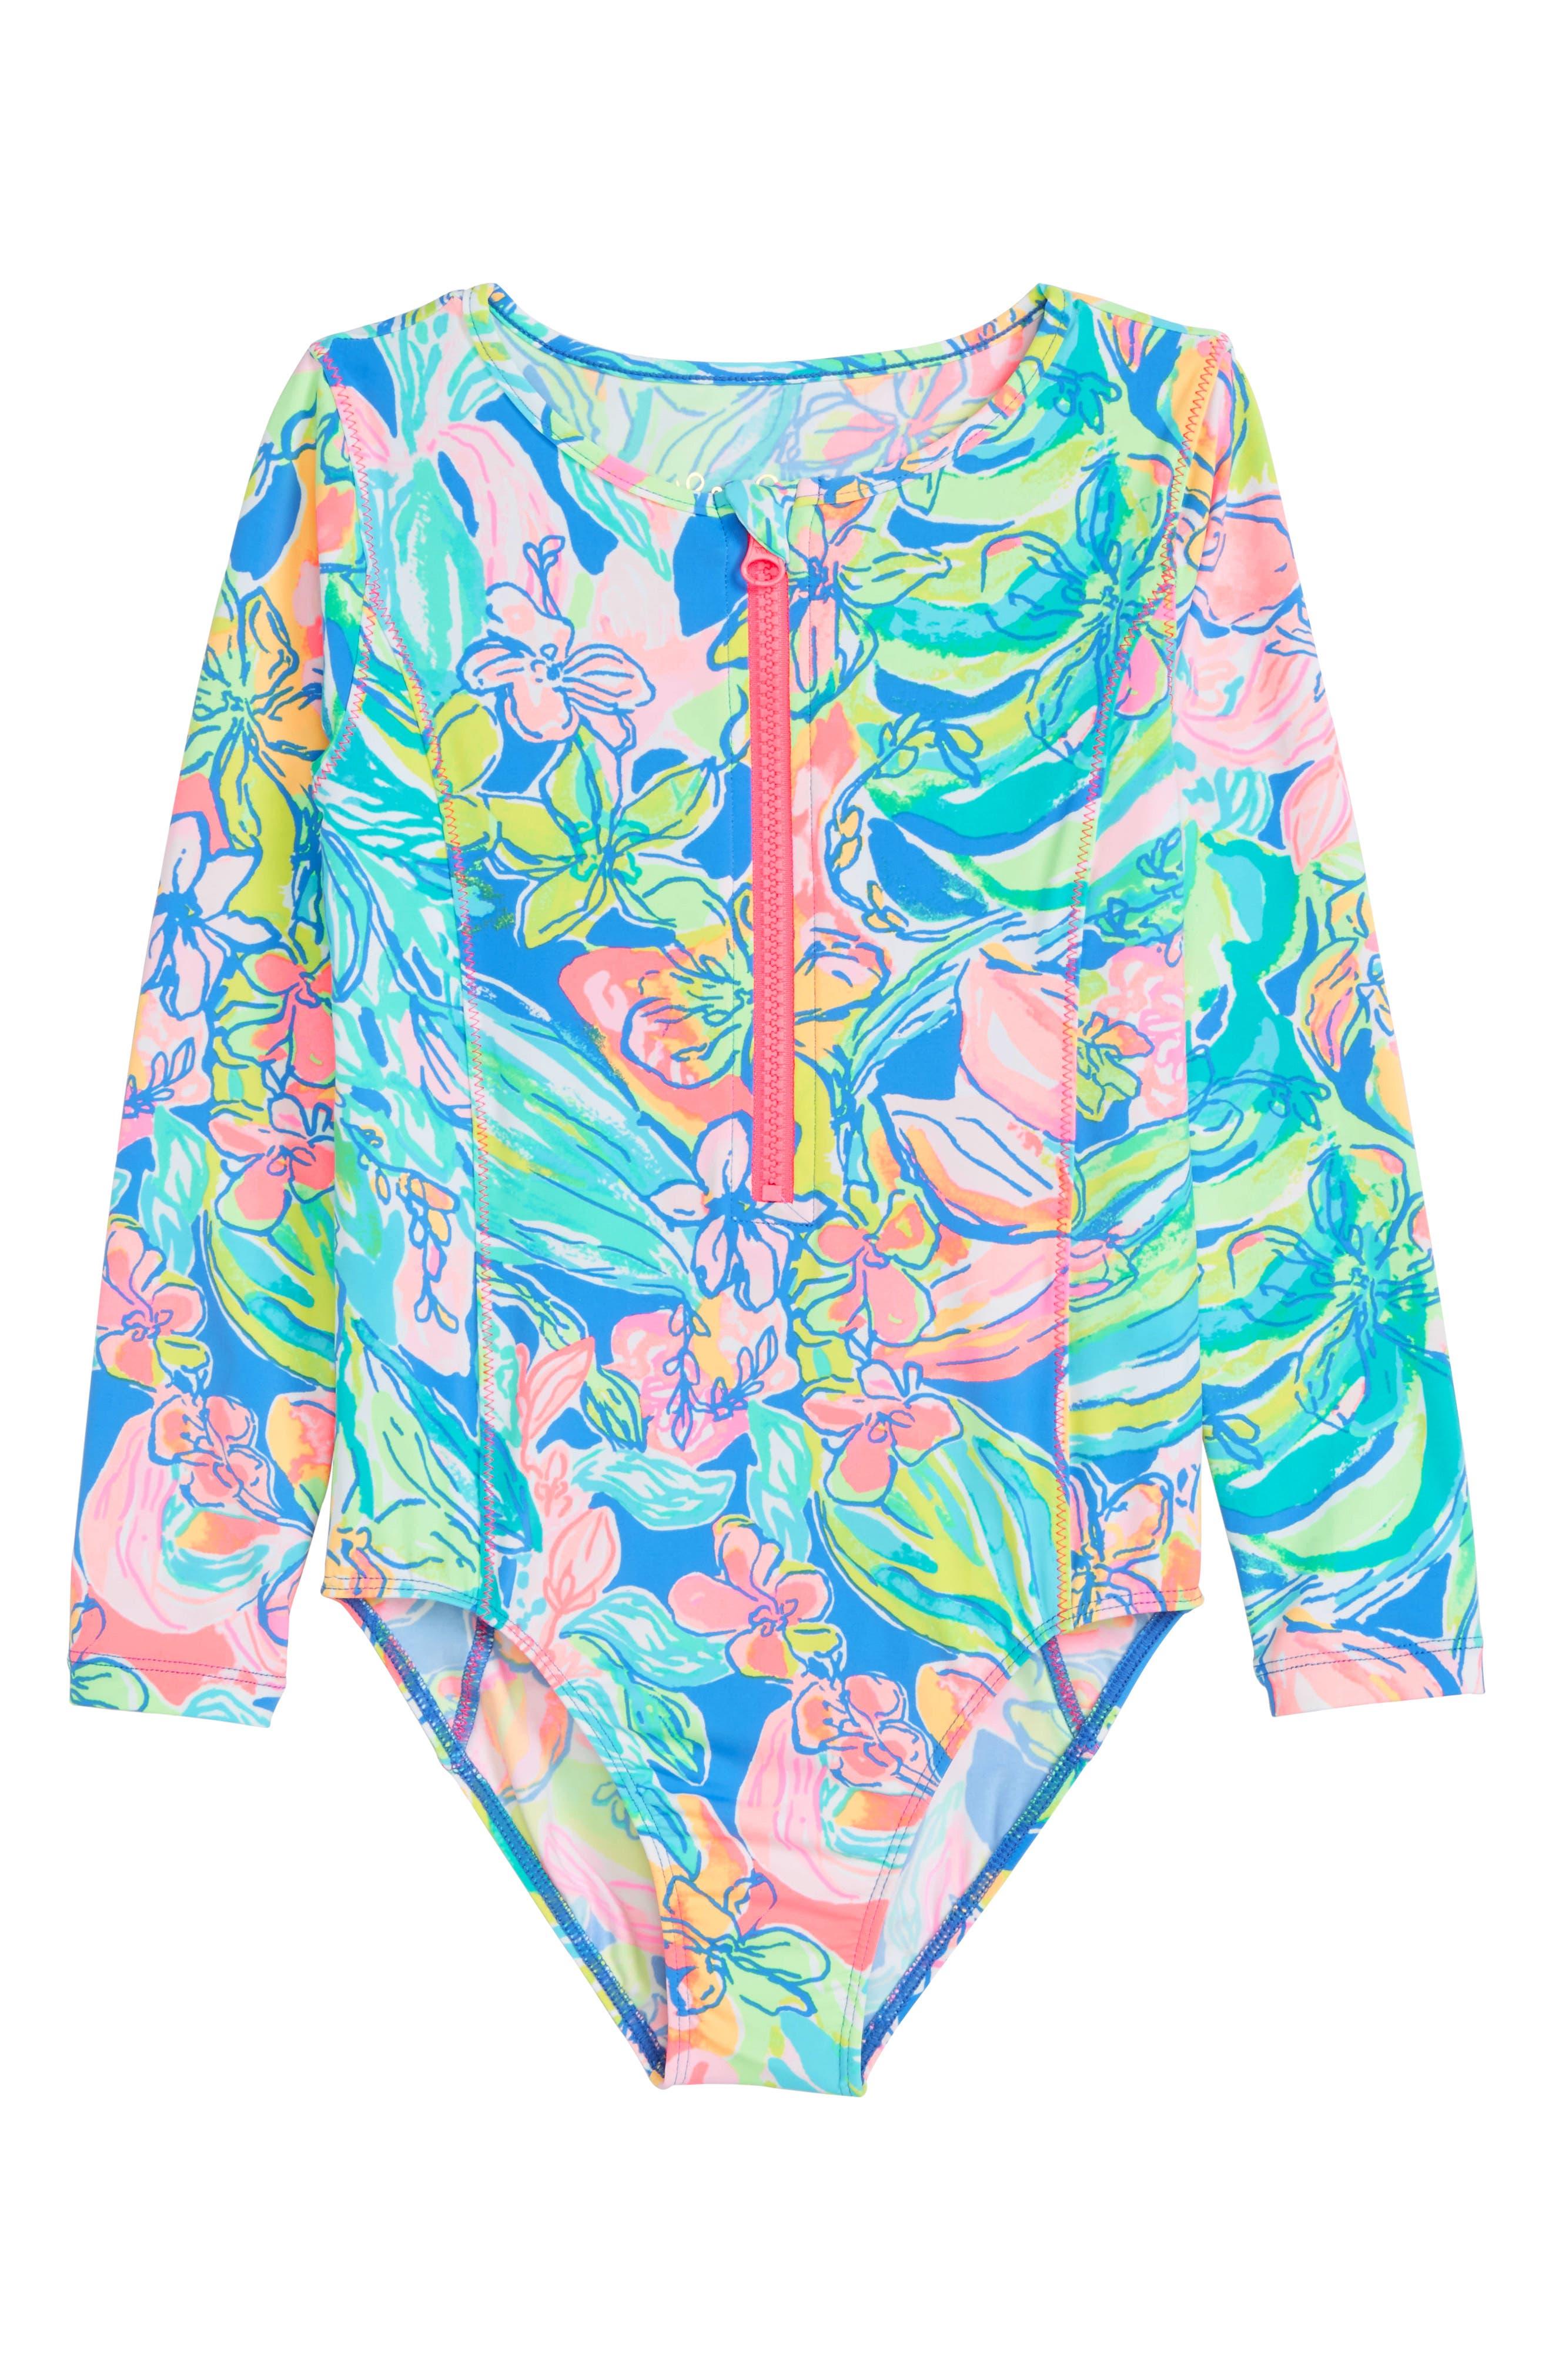 Lilly Pulitzer® Aliana UPF 50+ One-Piece Rashguard Swimsuit (Toddler Girls, Little Girls & Big Girls)